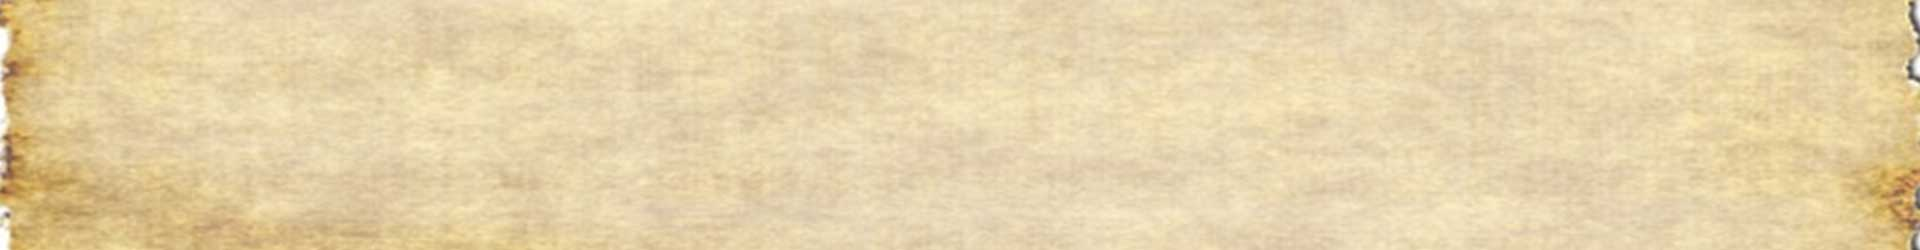 LayerSlider-1920×250-2